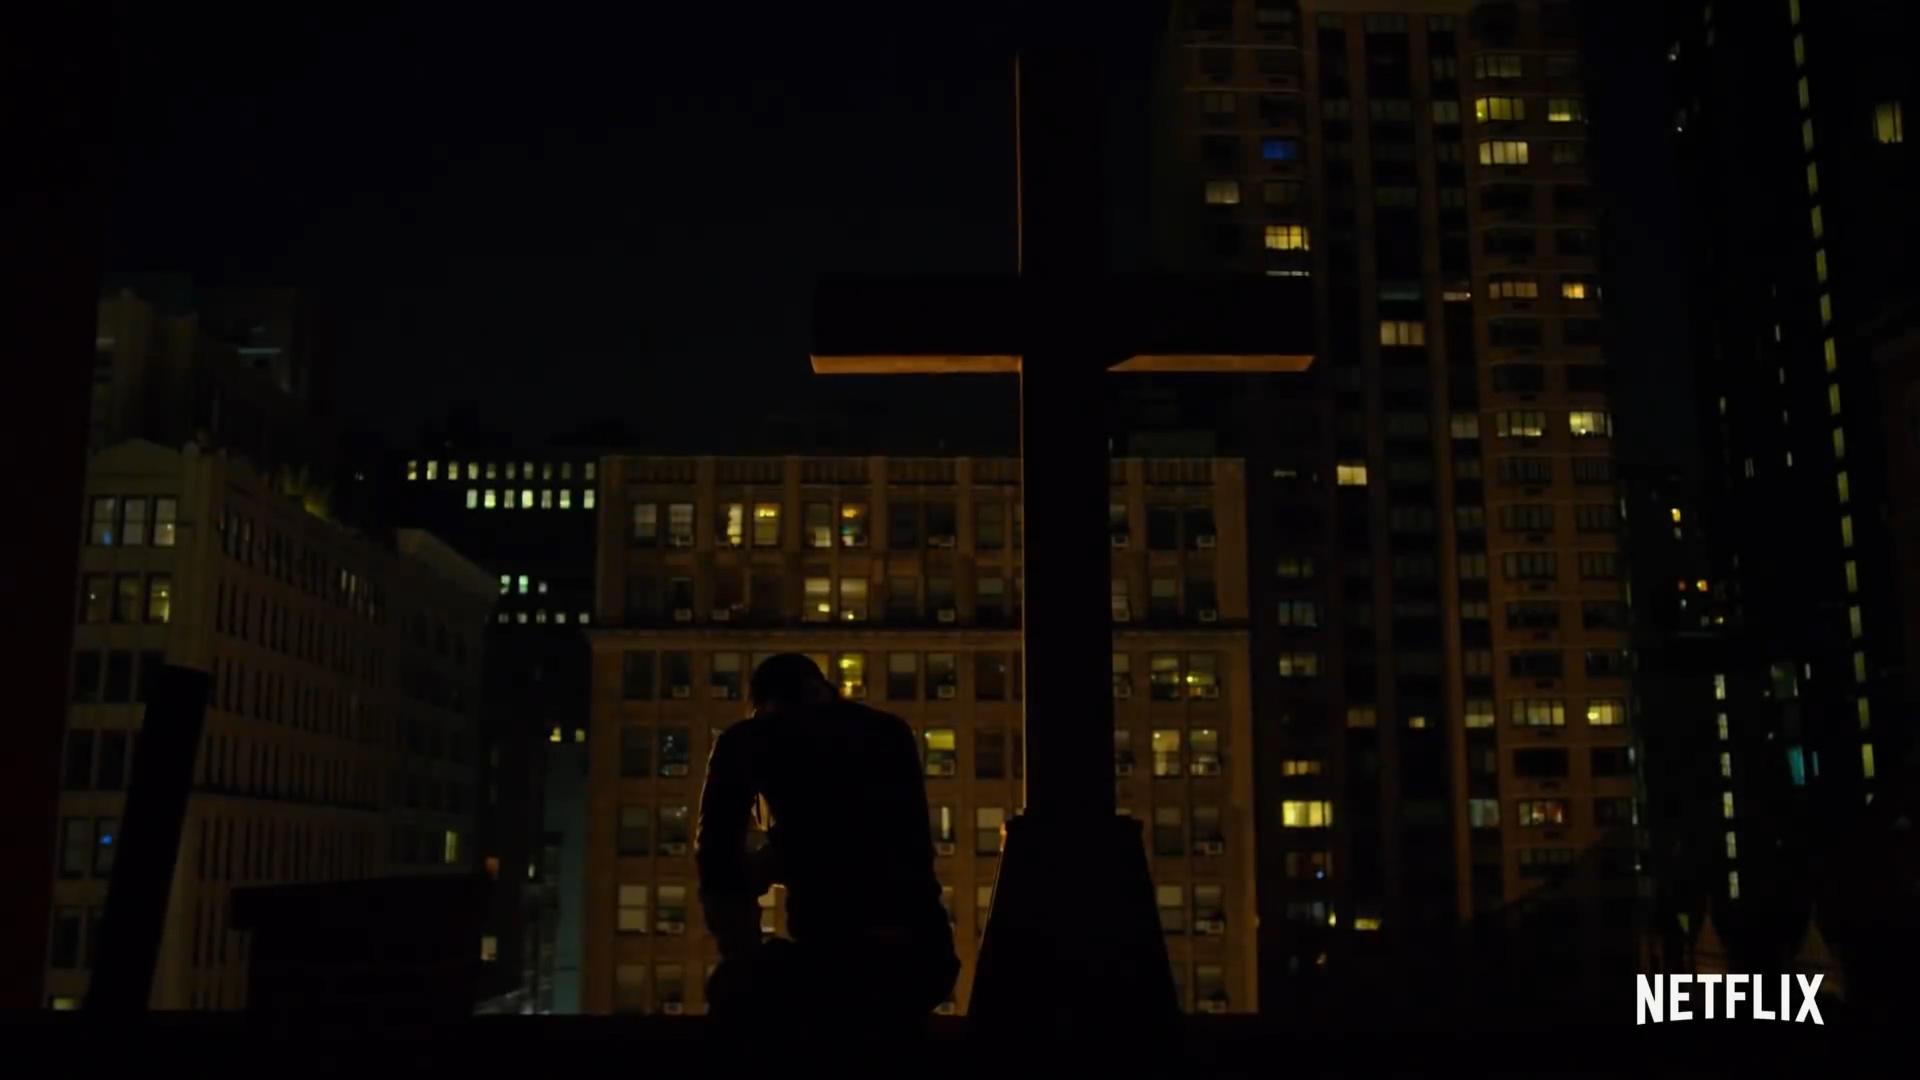 Marvel's Daredevil Season 3 - Official Trailer